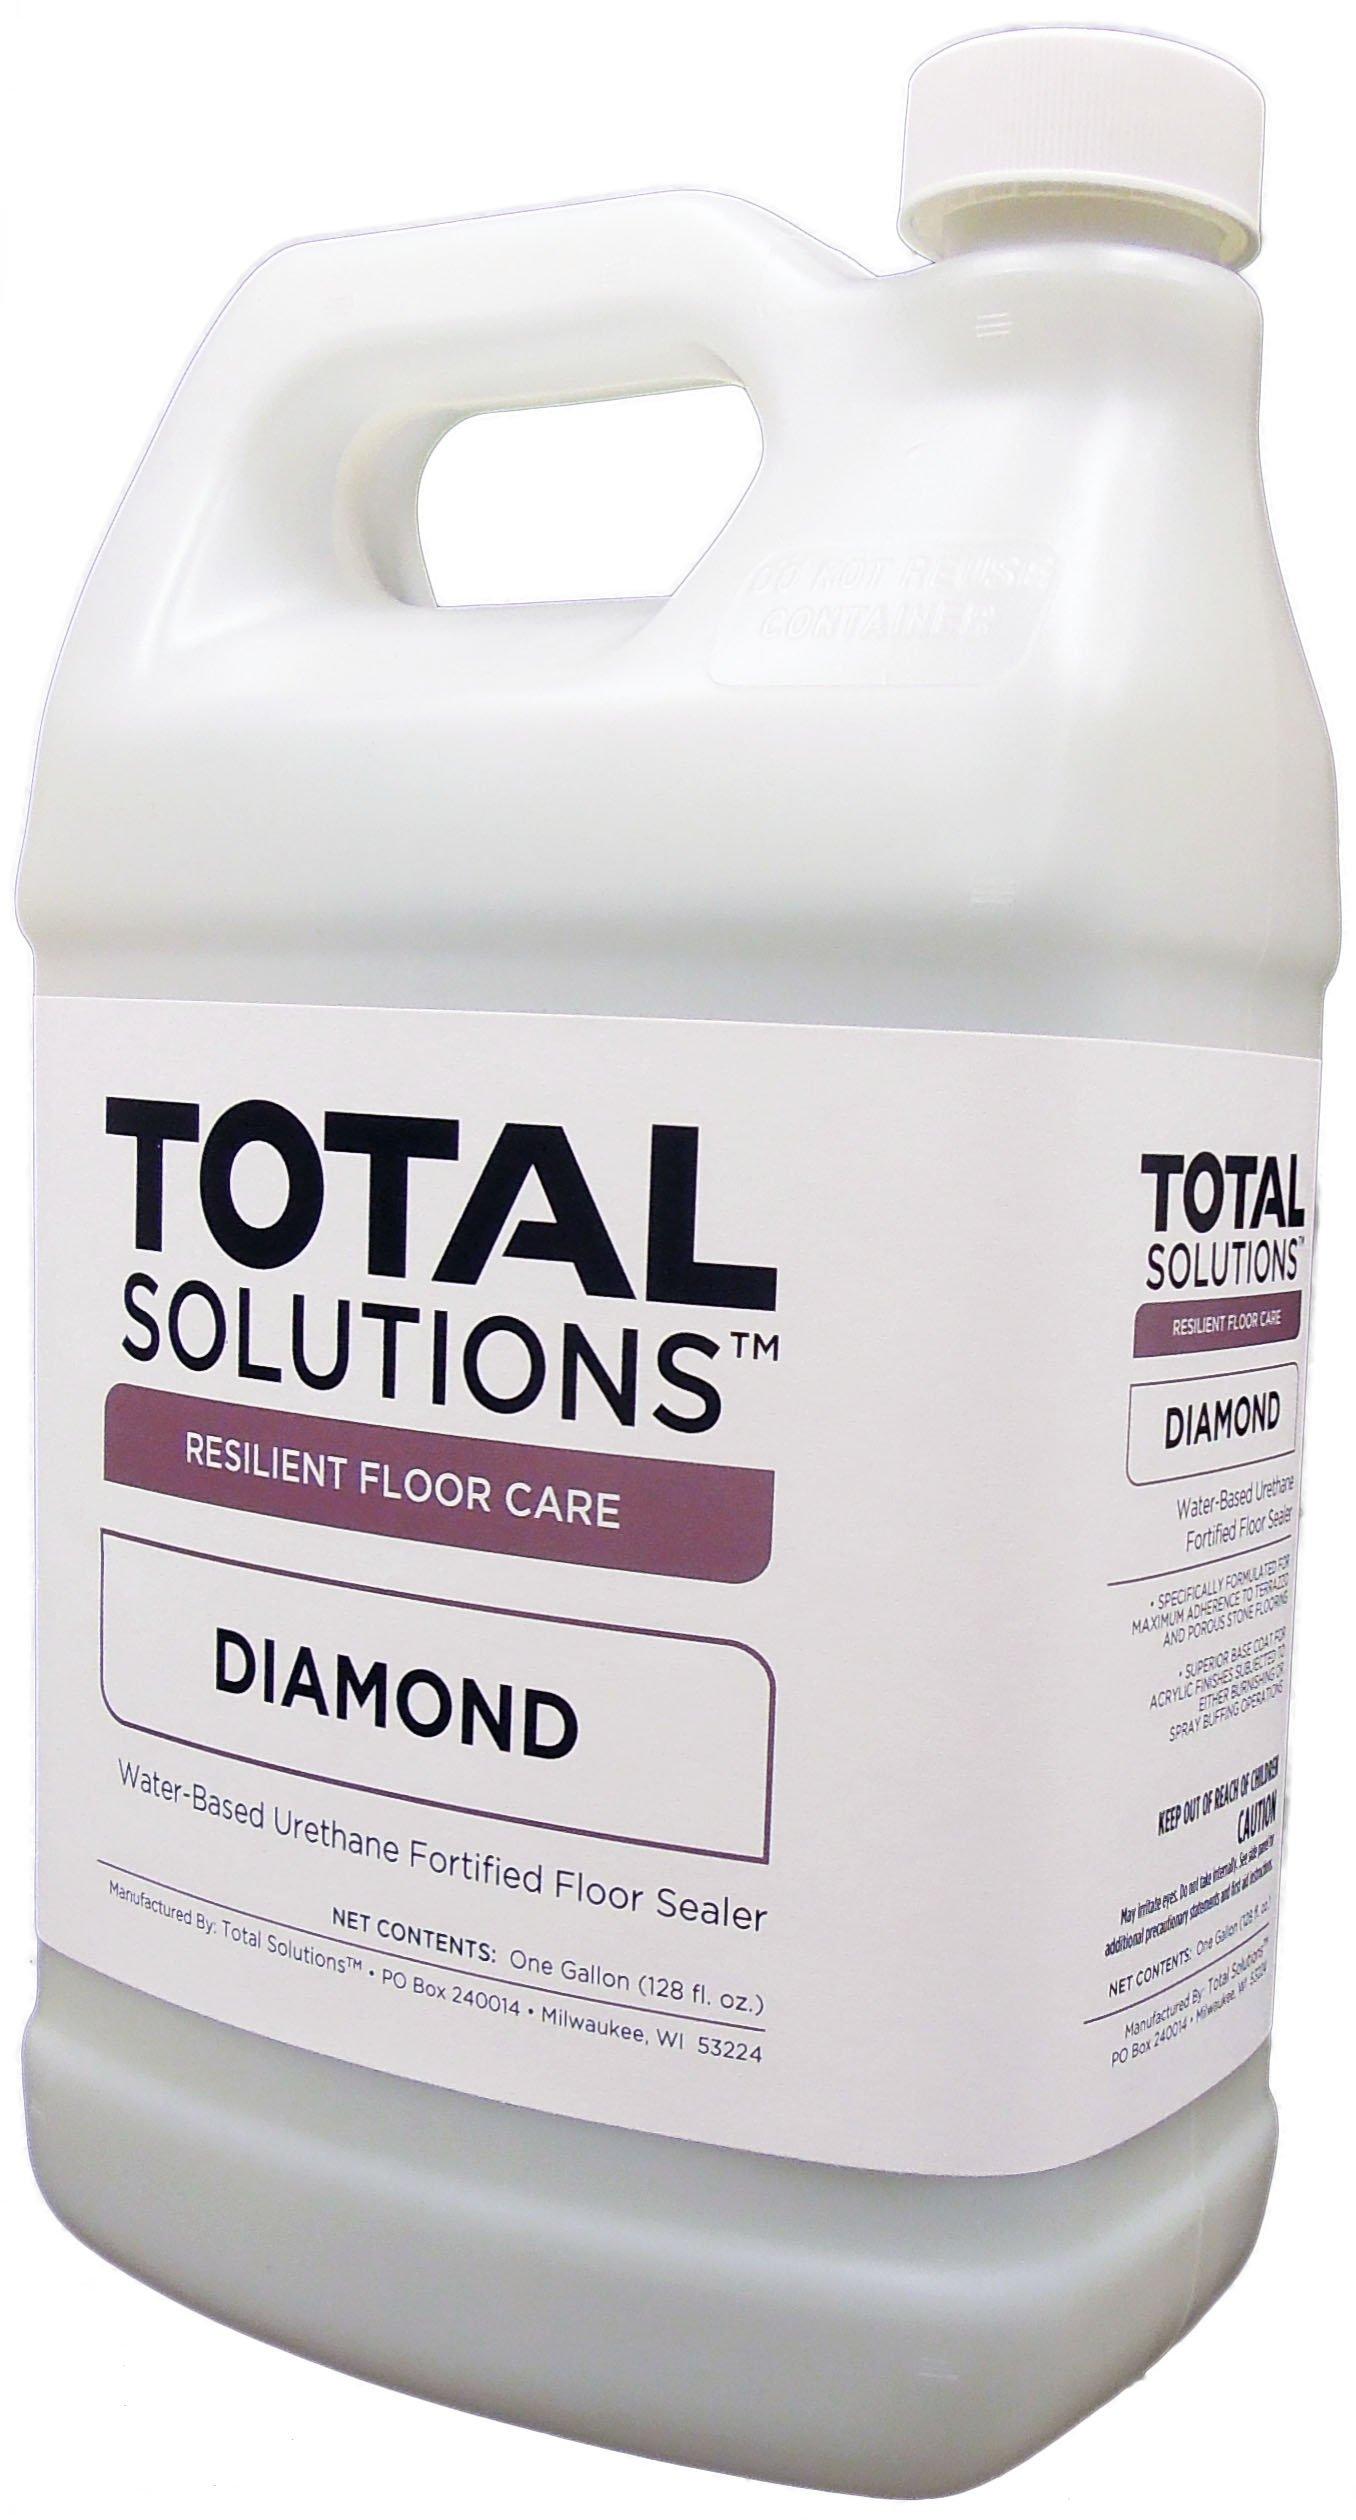 Diamond- Terazzo Finish, Water-based urethane finish & sealer - 4 Gallons